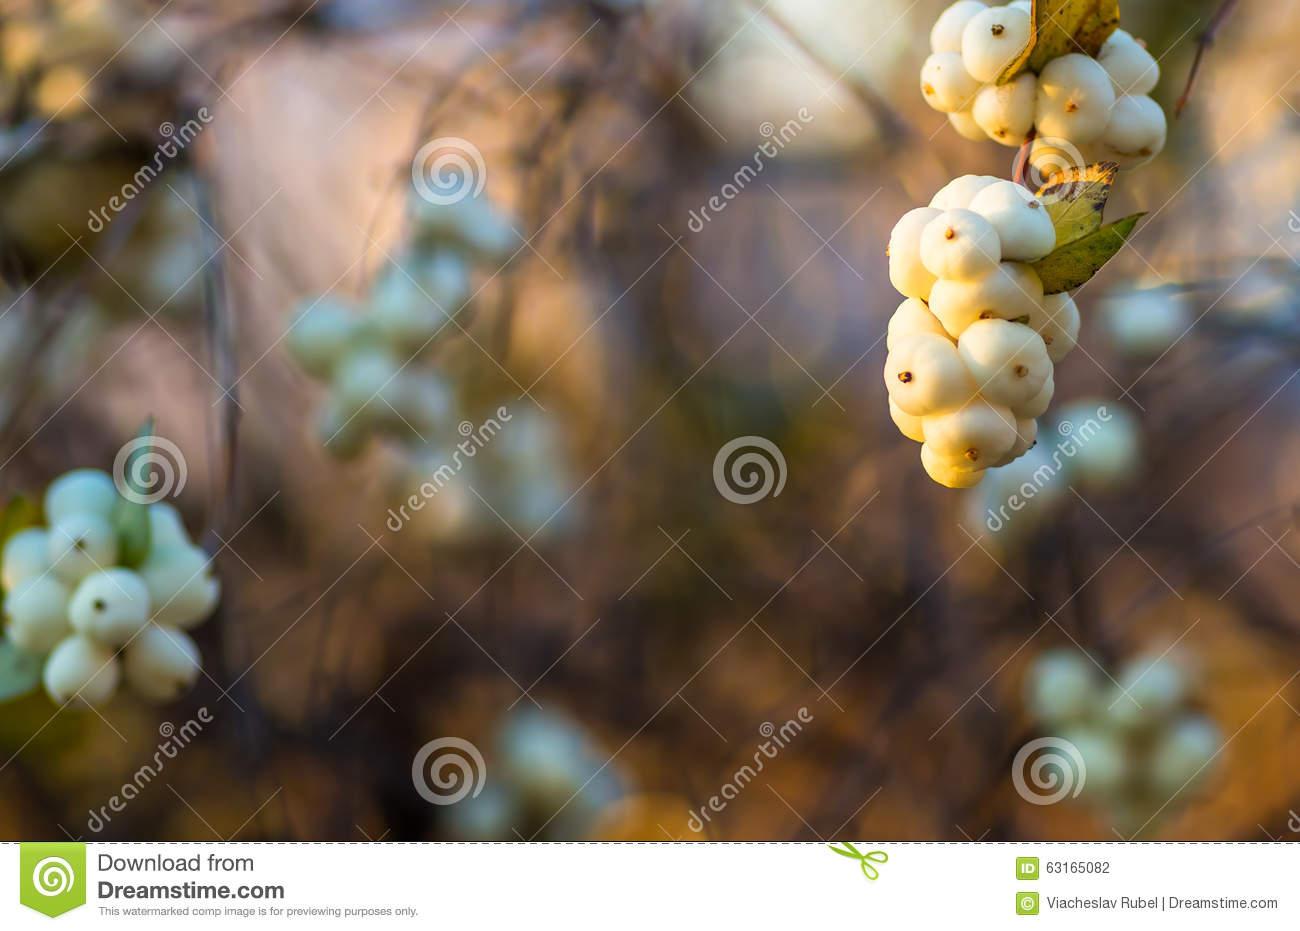 White Berries Symphoricarpos Albus Laevigatus Stock Photo.